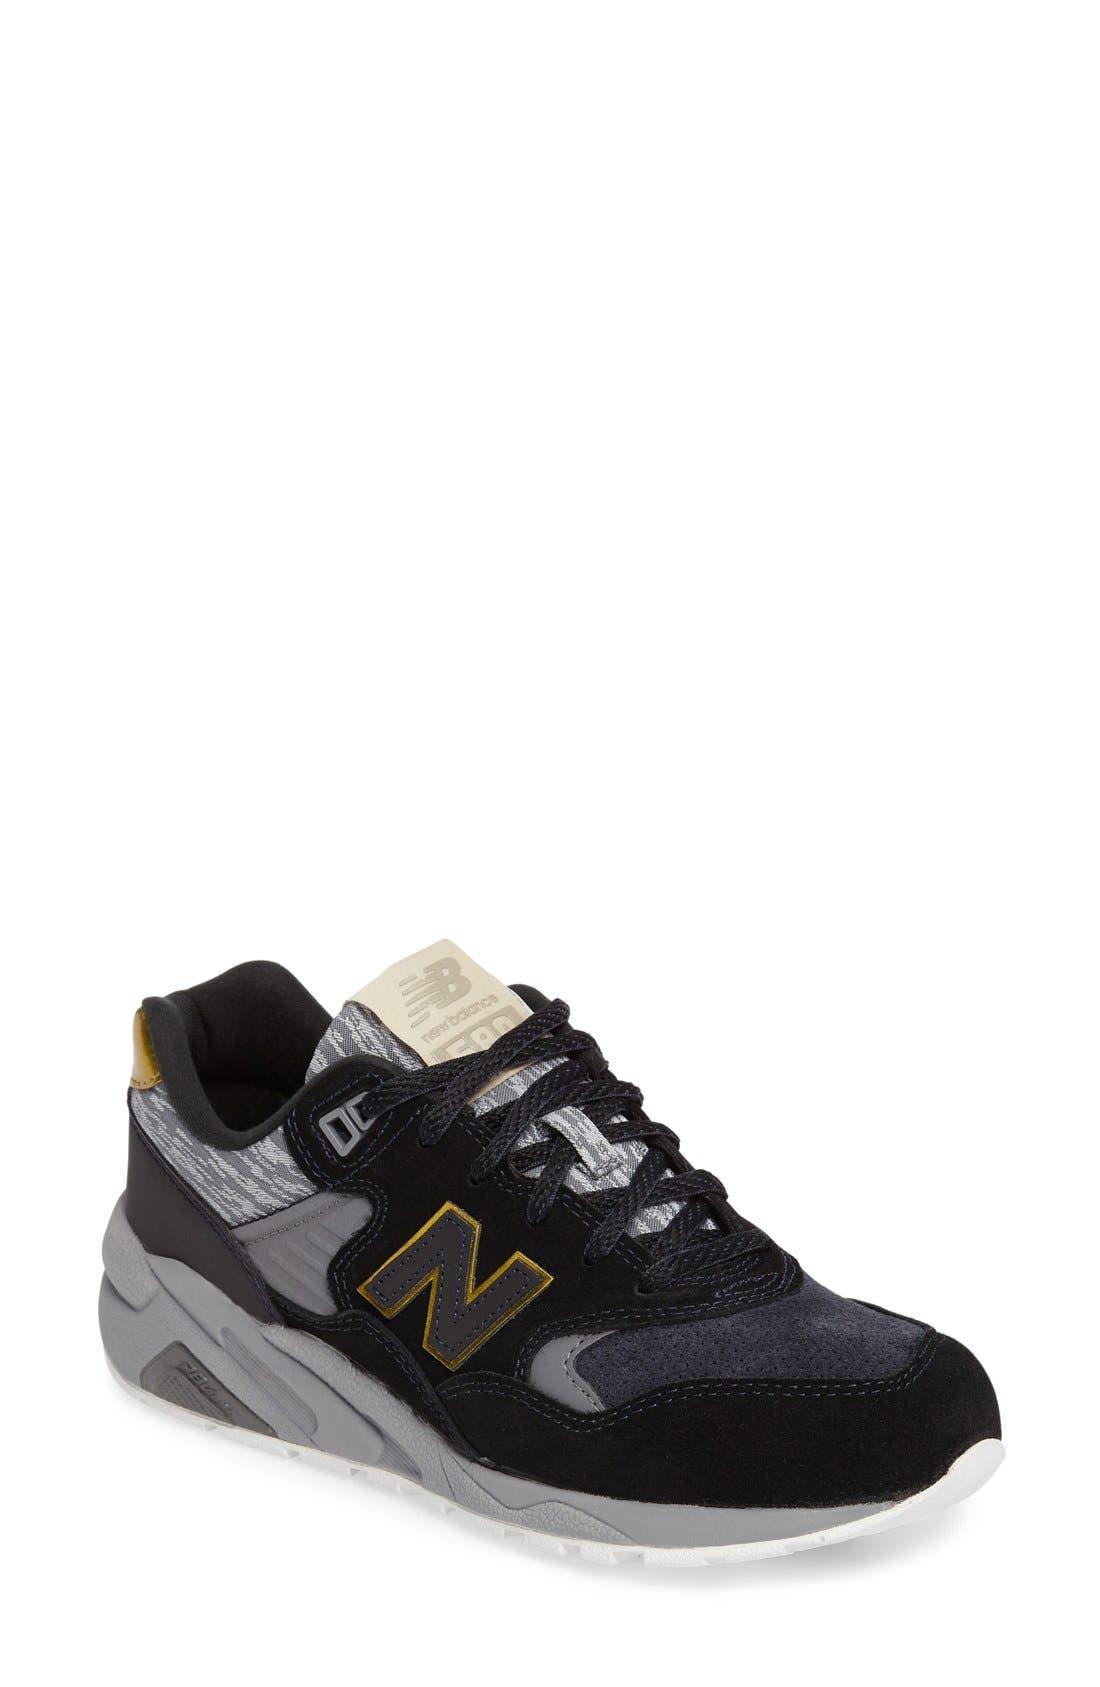 Alternate Image 1 Selected - New Balance 580 Sneaker (Women)